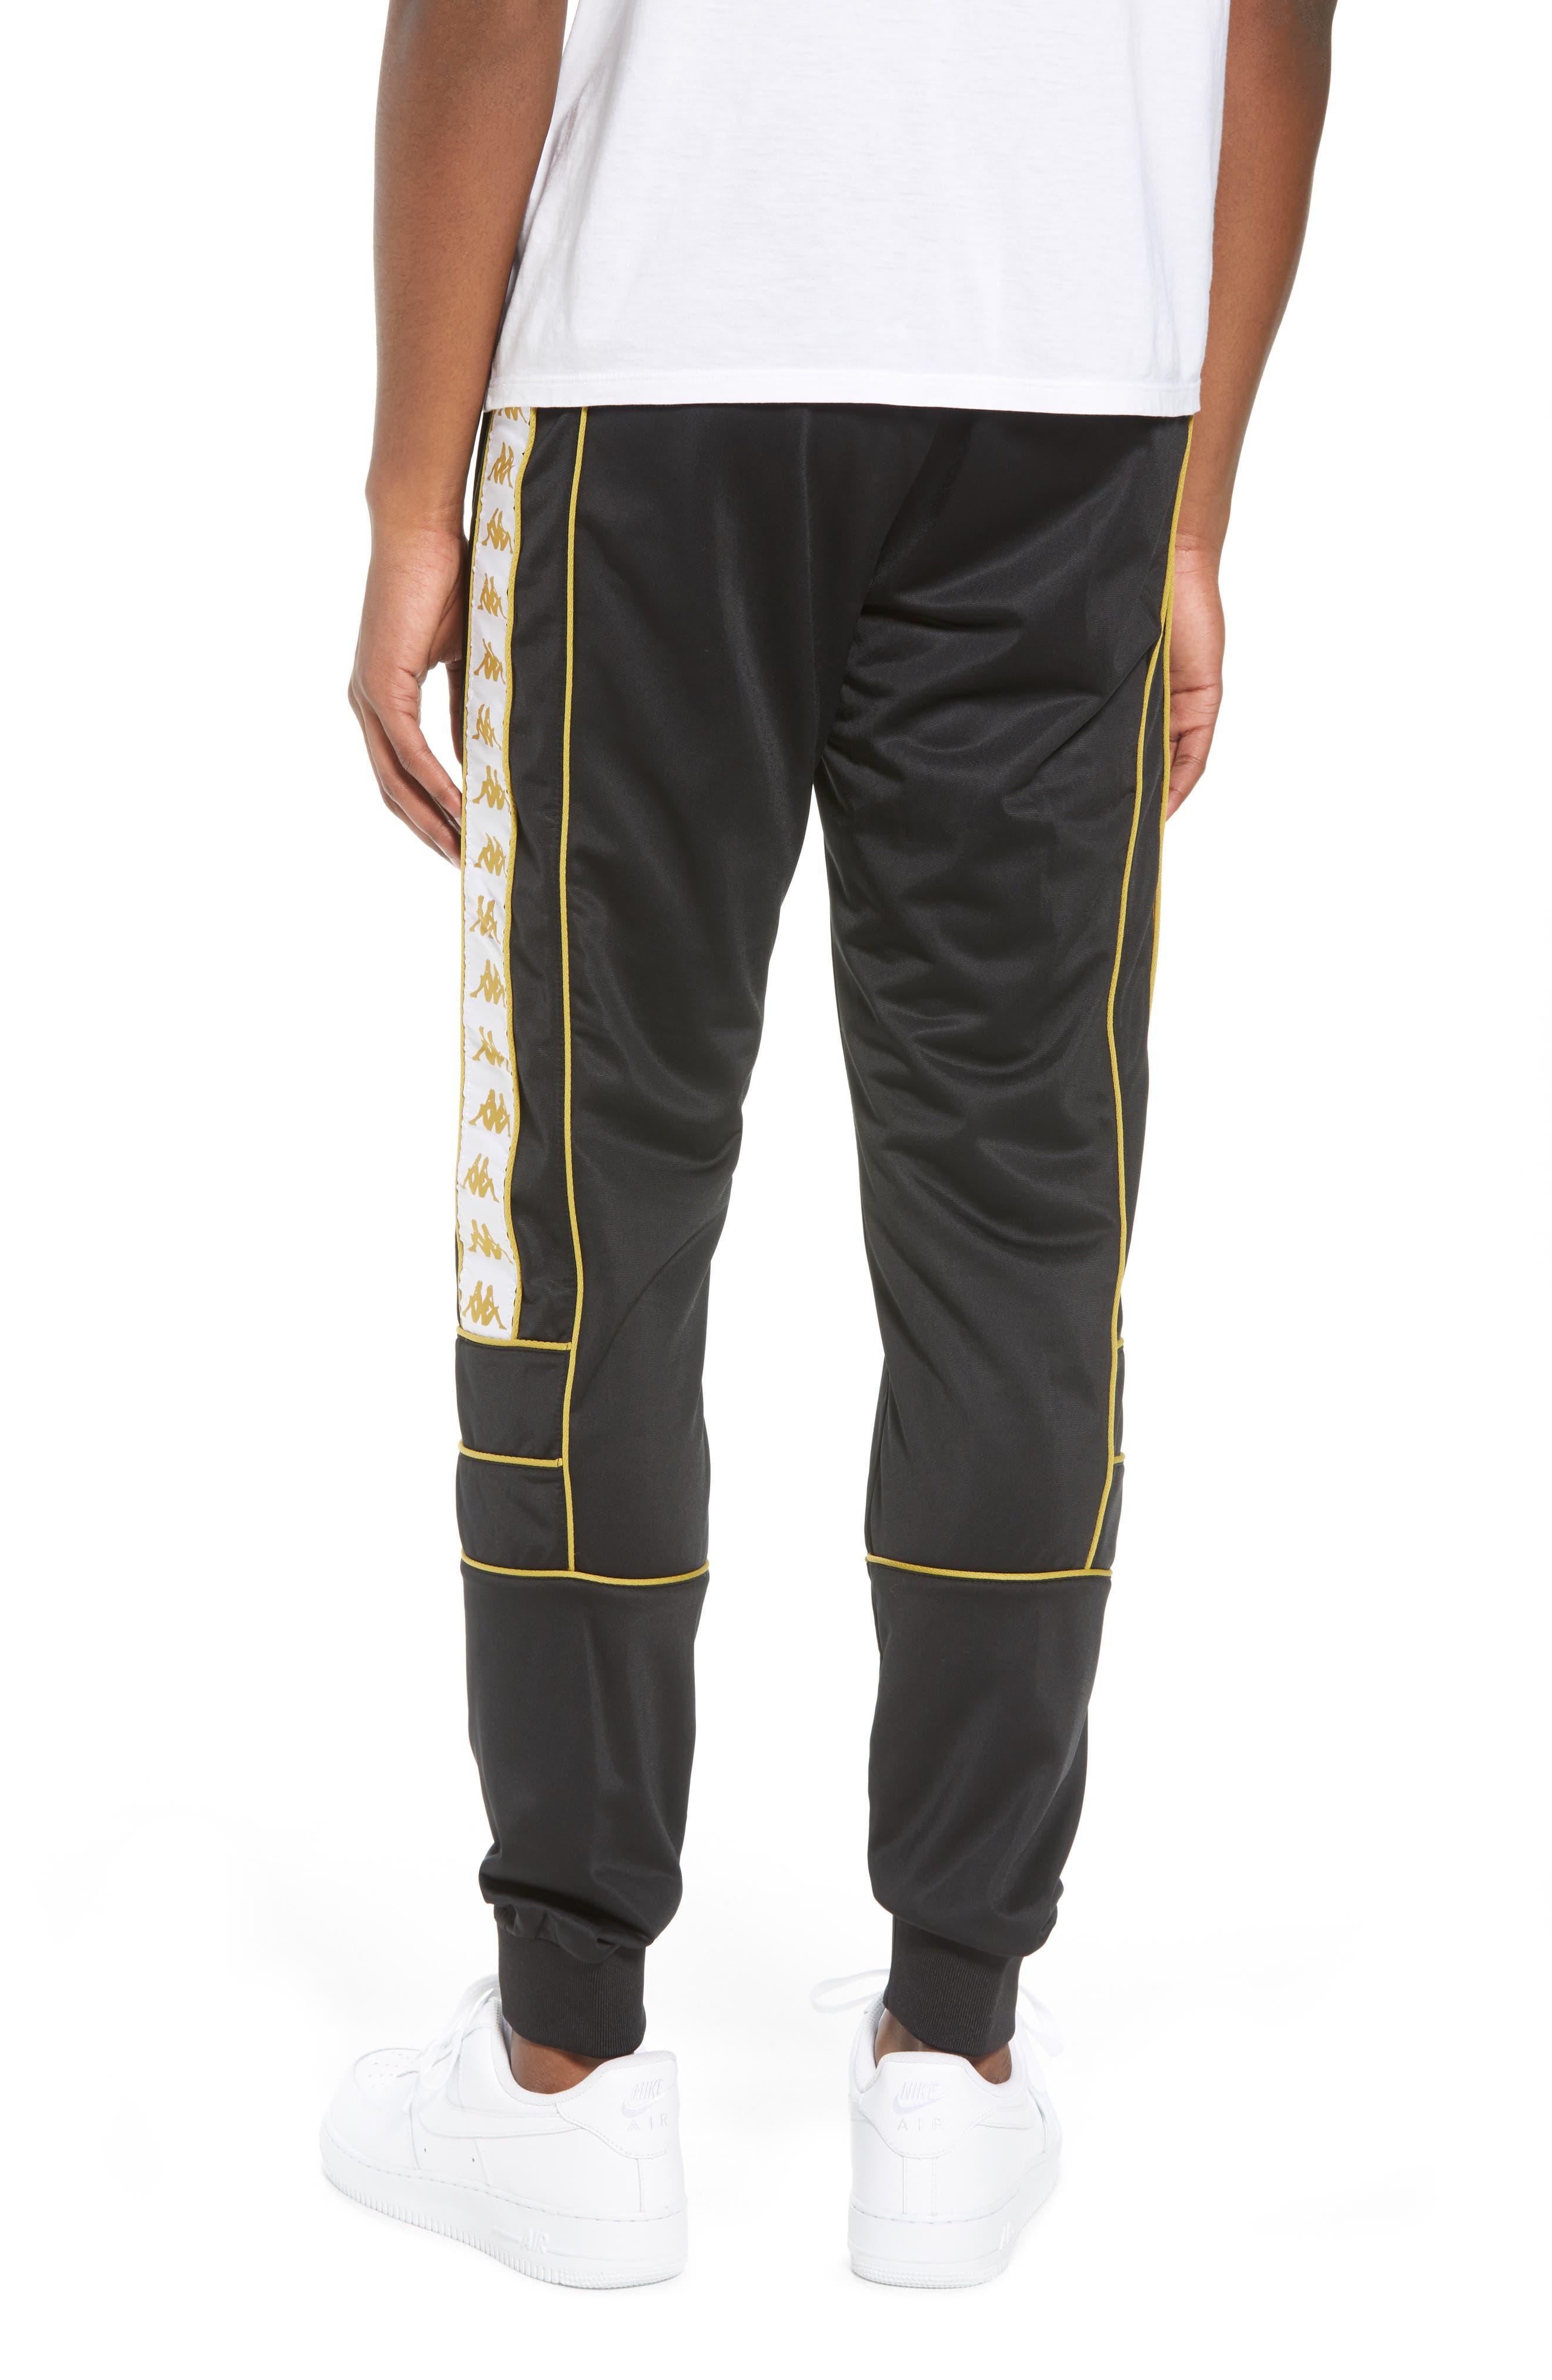 Racing Track Pants,                             Alternate thumbnail 2, color,                             Black/ White Gold